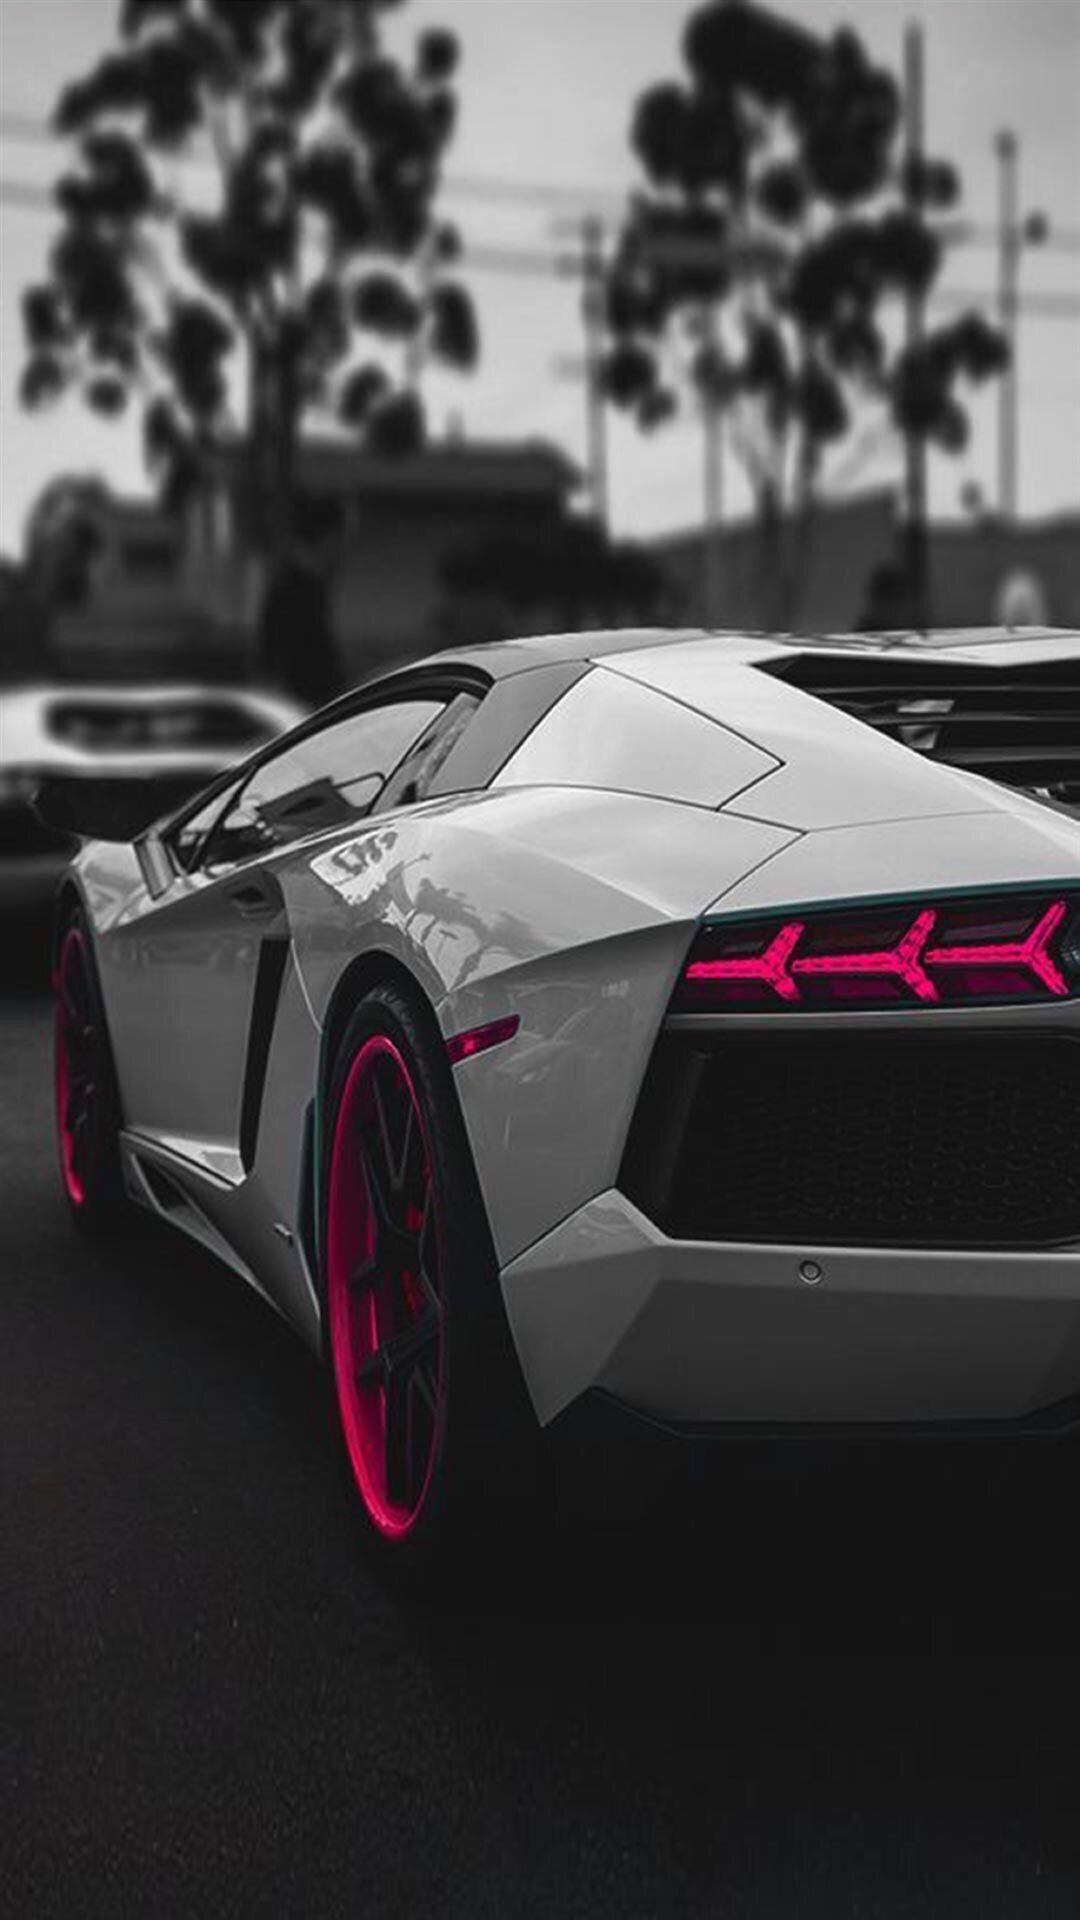 Lamborghini Iphone Wallpapers Top Free Lamborghini Iphone Backgrounds Wallpaperaccess